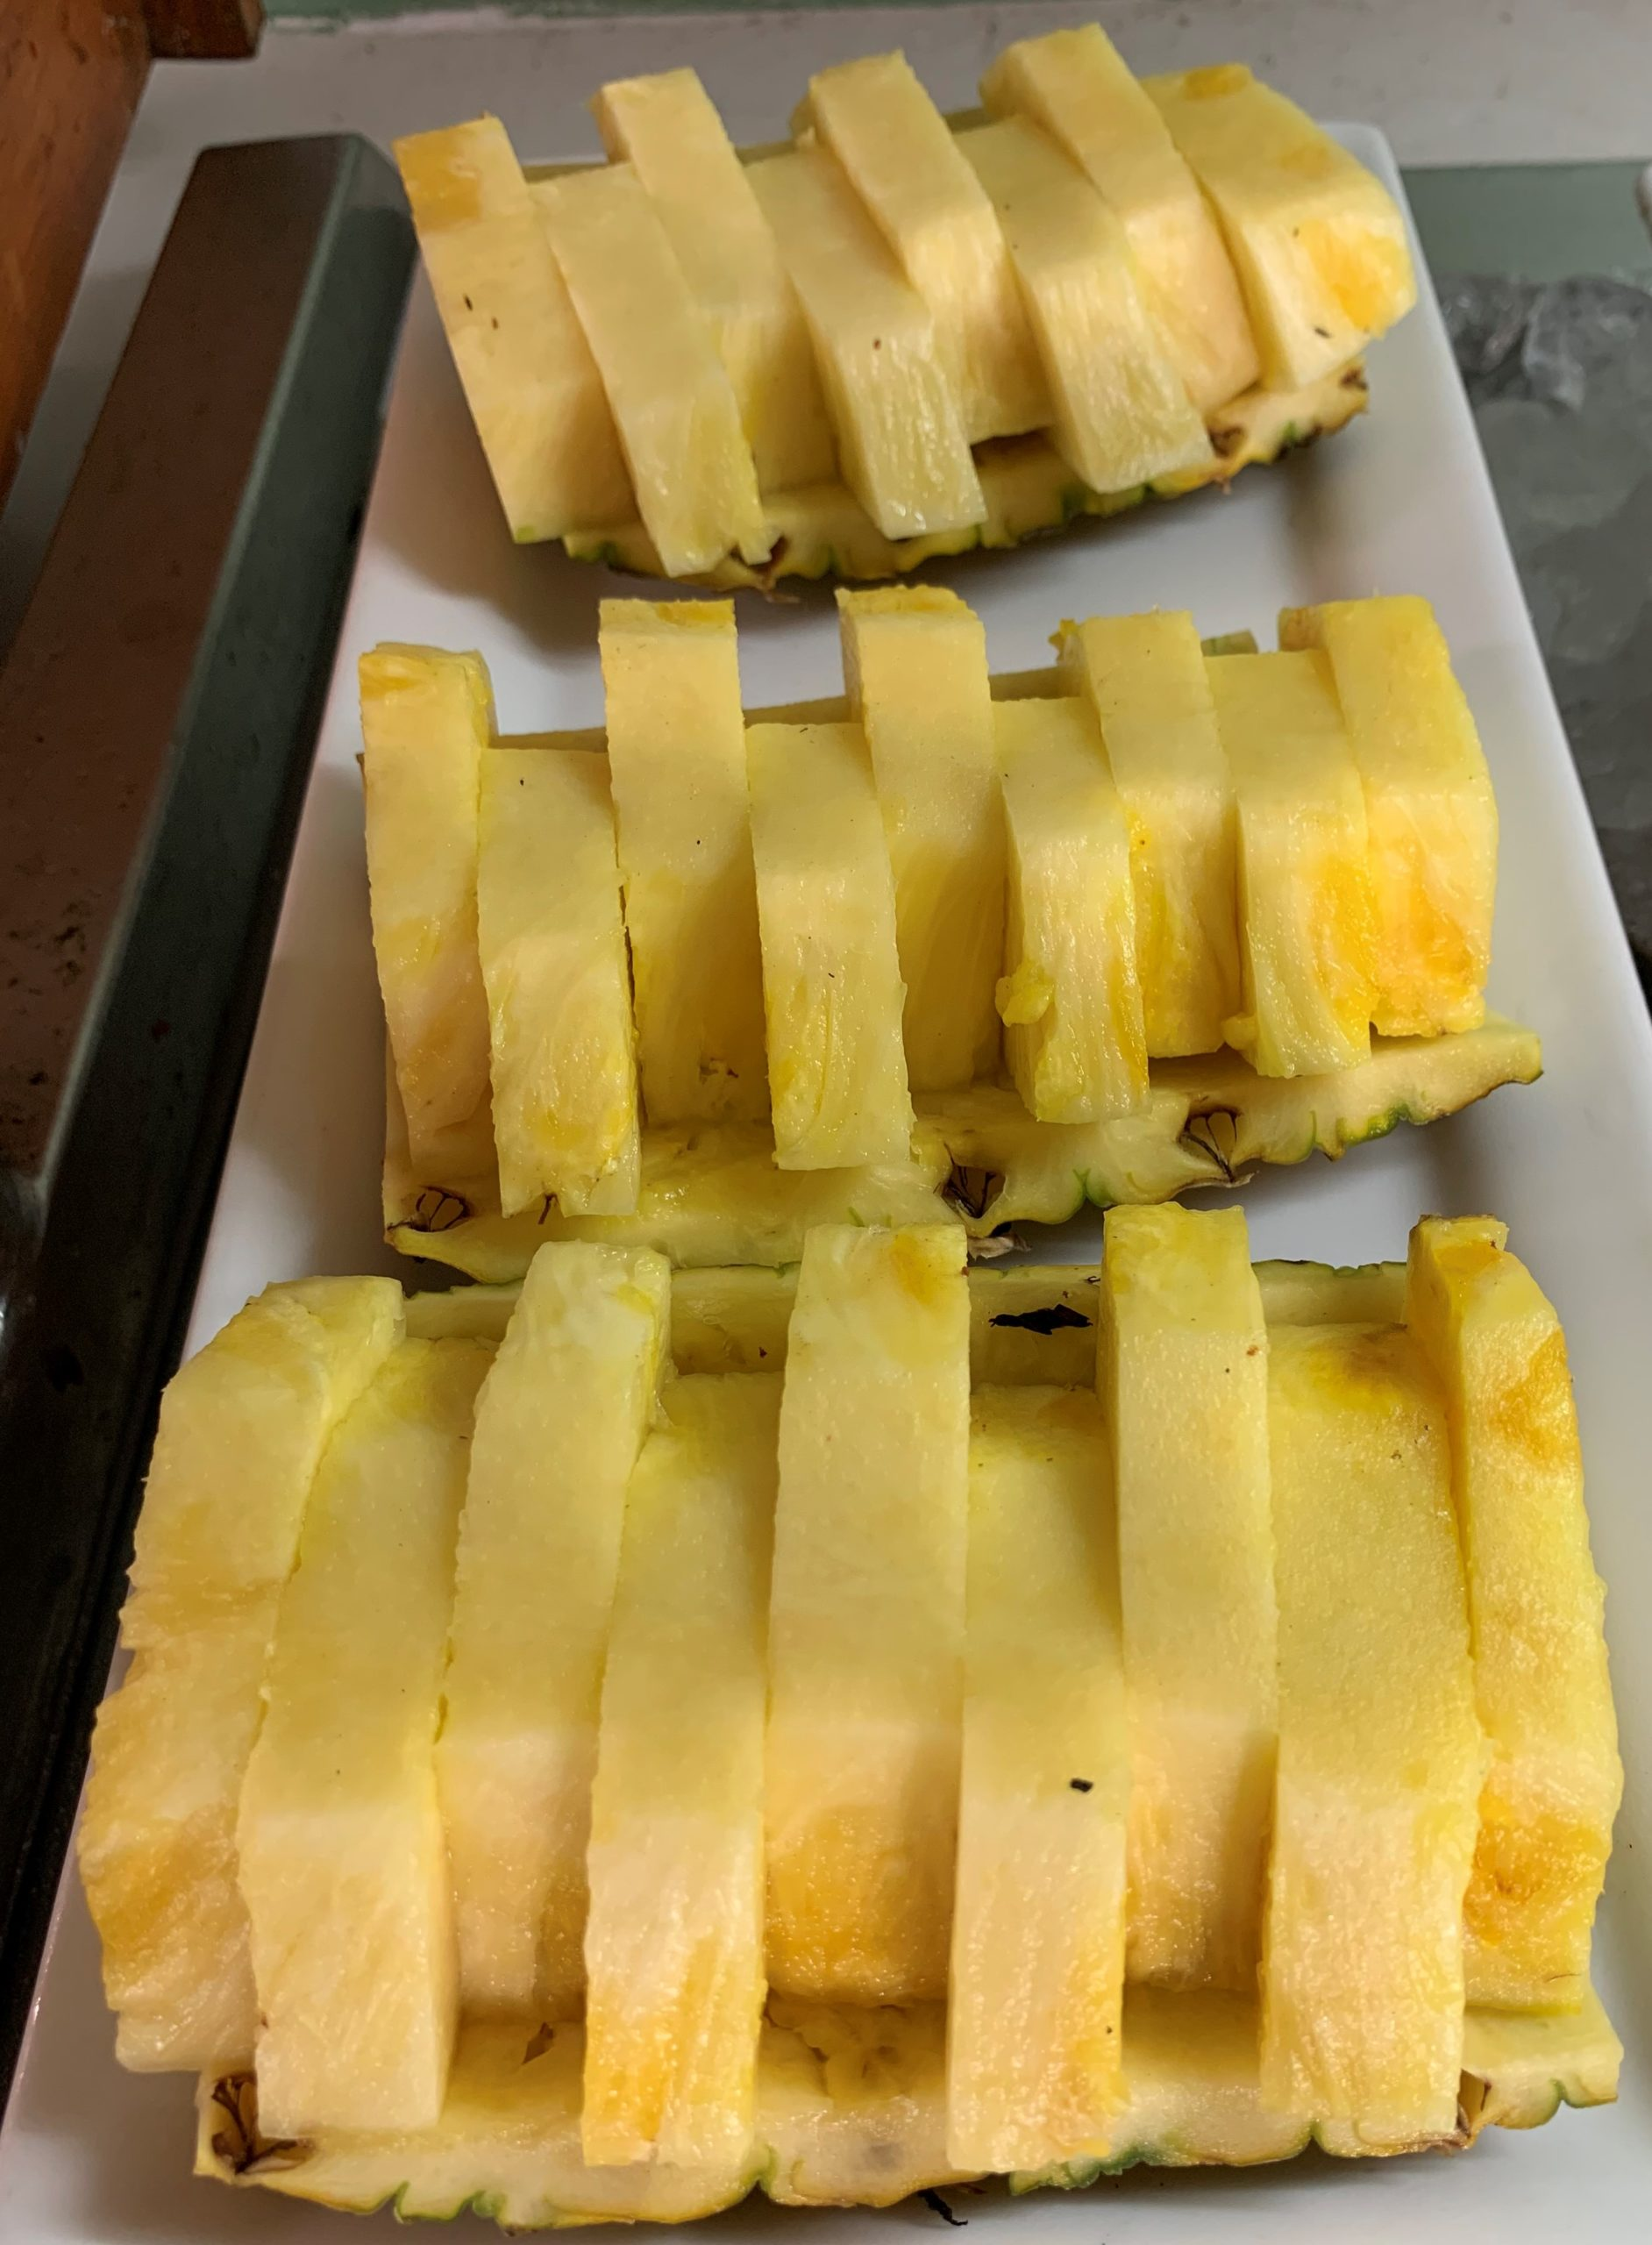 Pineapple cut up sliced Mahekal Beach Resort Playa del Carmen Fruit Photo IMG_0961